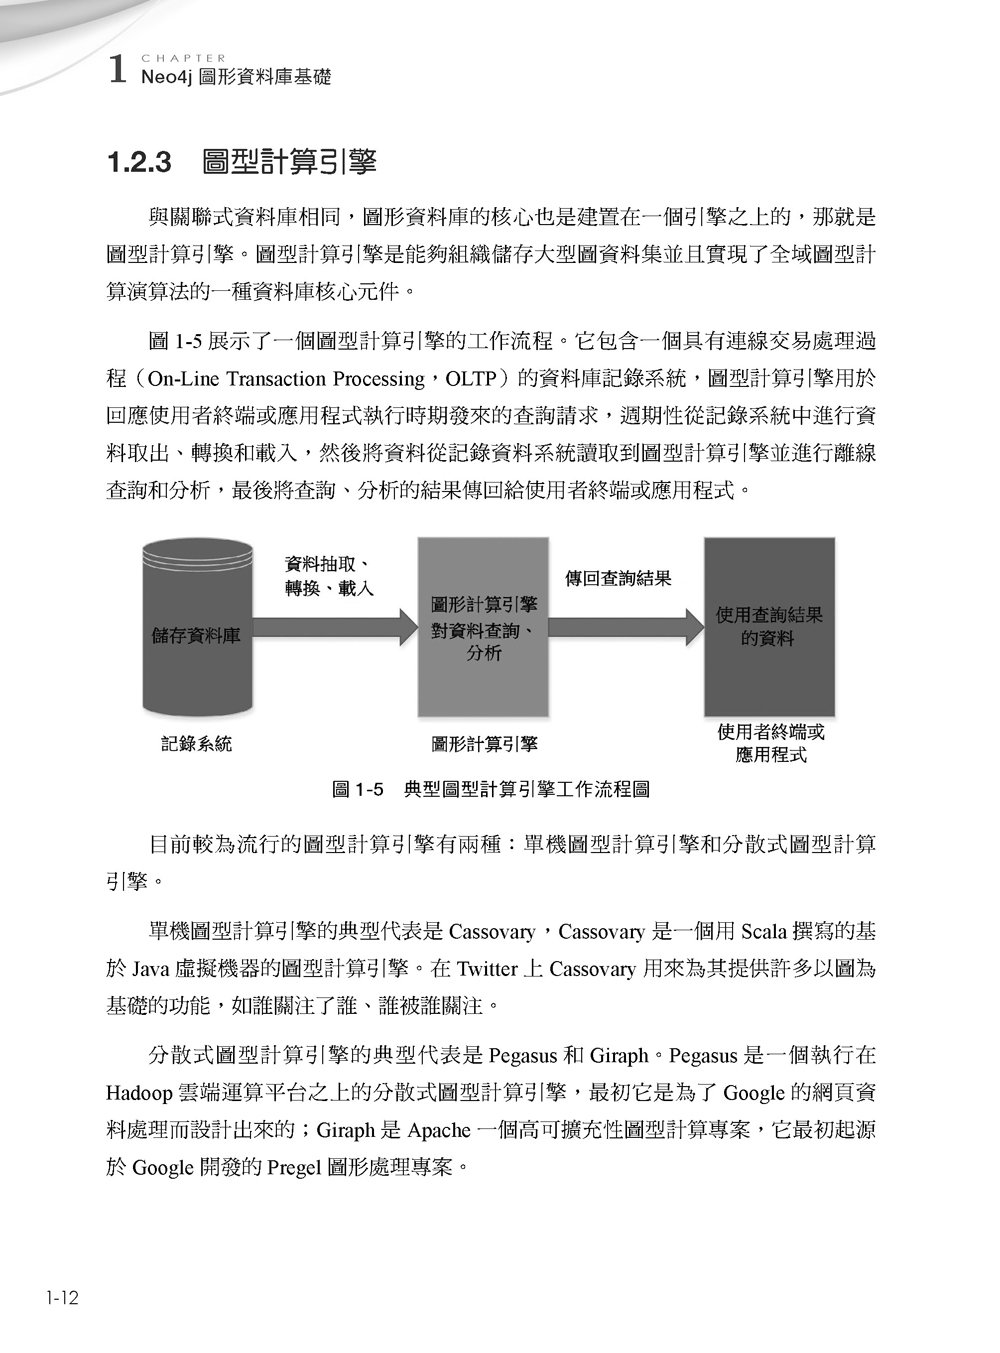 Neo4j 大事典 : 圖形資料庫 & 大數據時代-preview-7